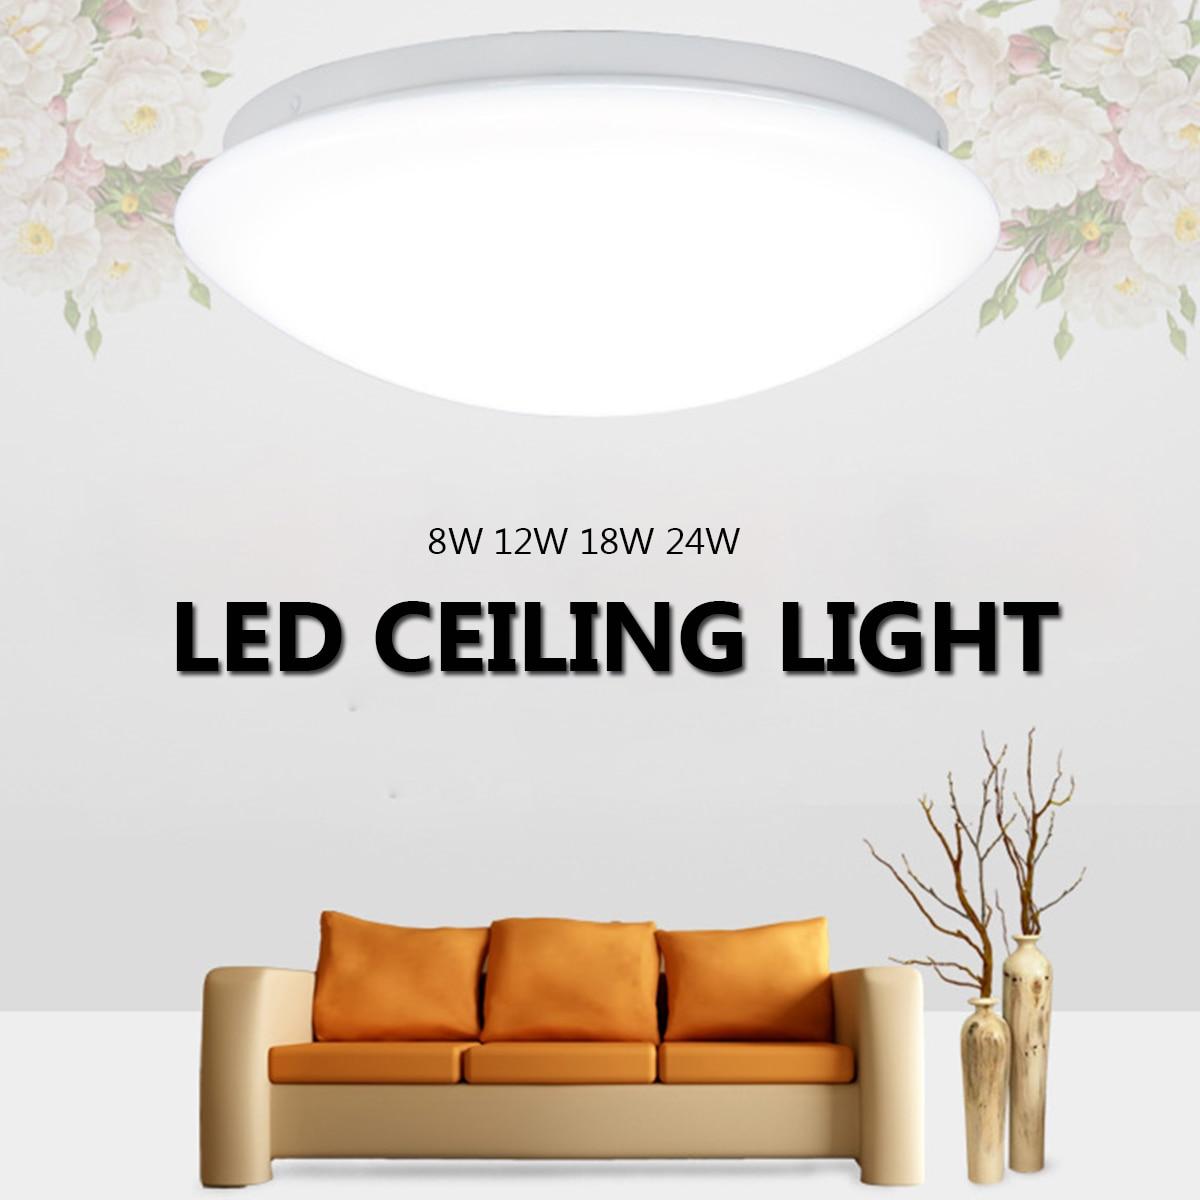 100% Kwaliteit 8/12/18/24 W Moderne Ronde Led Plafond Lights Luminaria Plafondlamp Voor Woonkamer Slaapkamer Home Decoratieve Armaturen Verlichting Duidelijk Effect